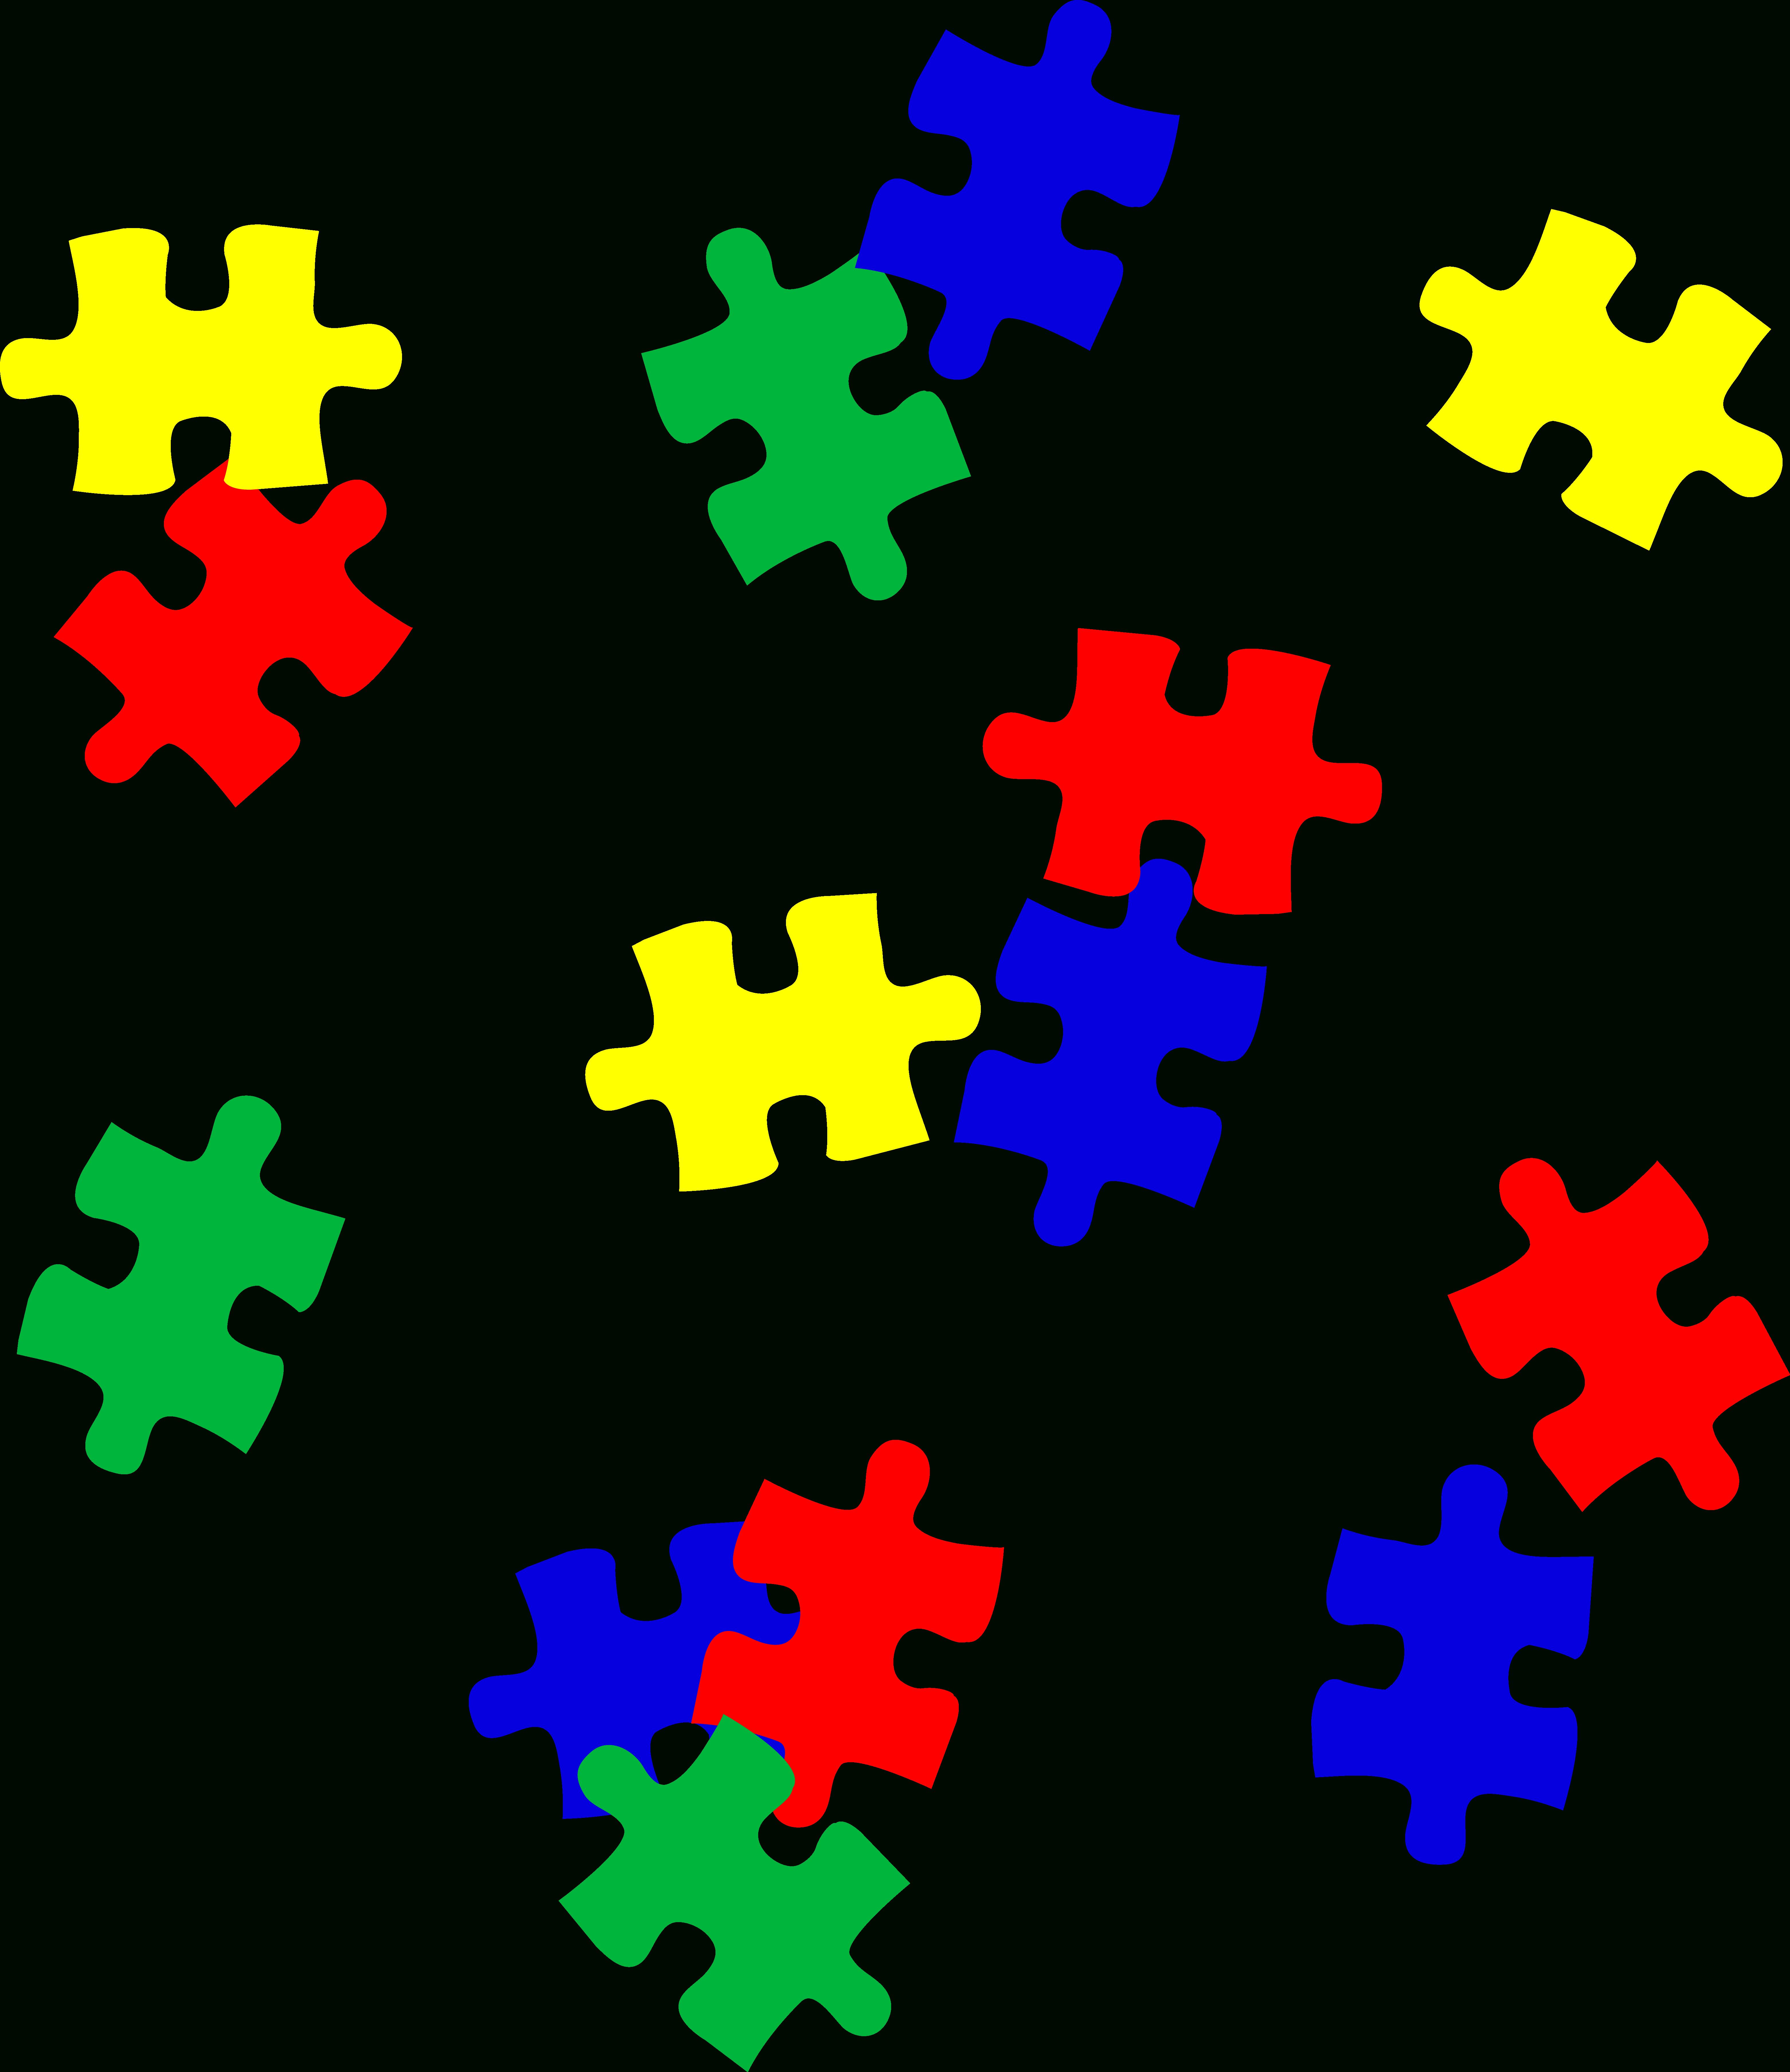 Free Autism Cliparts, Download Free Clip Art, Free Clip Art On - Free Printable Autism Puzzle Piece